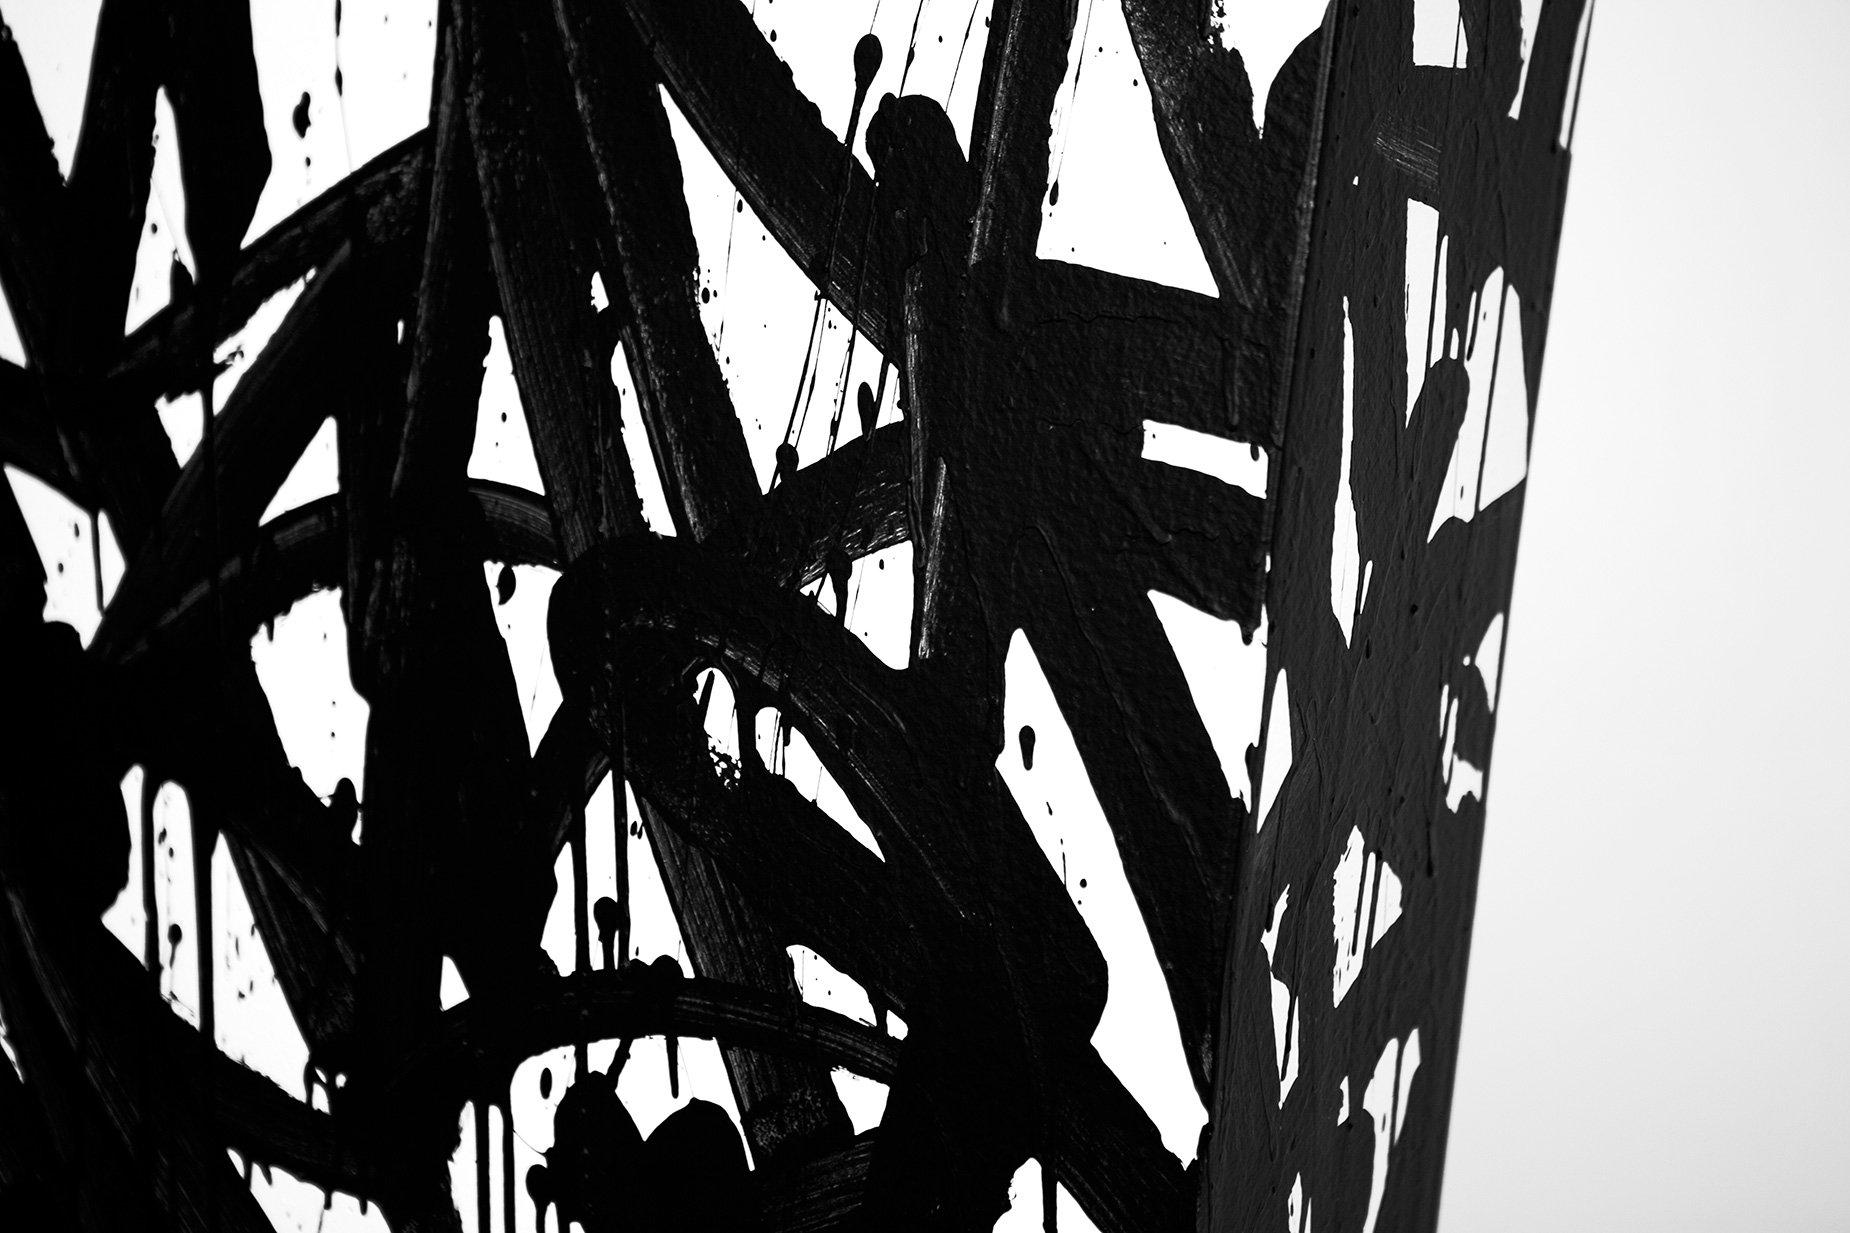 TILSITT GALLERY BISCO SMITH 181201_Scope_HEADABOVEWATER-B_Monolith_Detail_Web_2048x2048